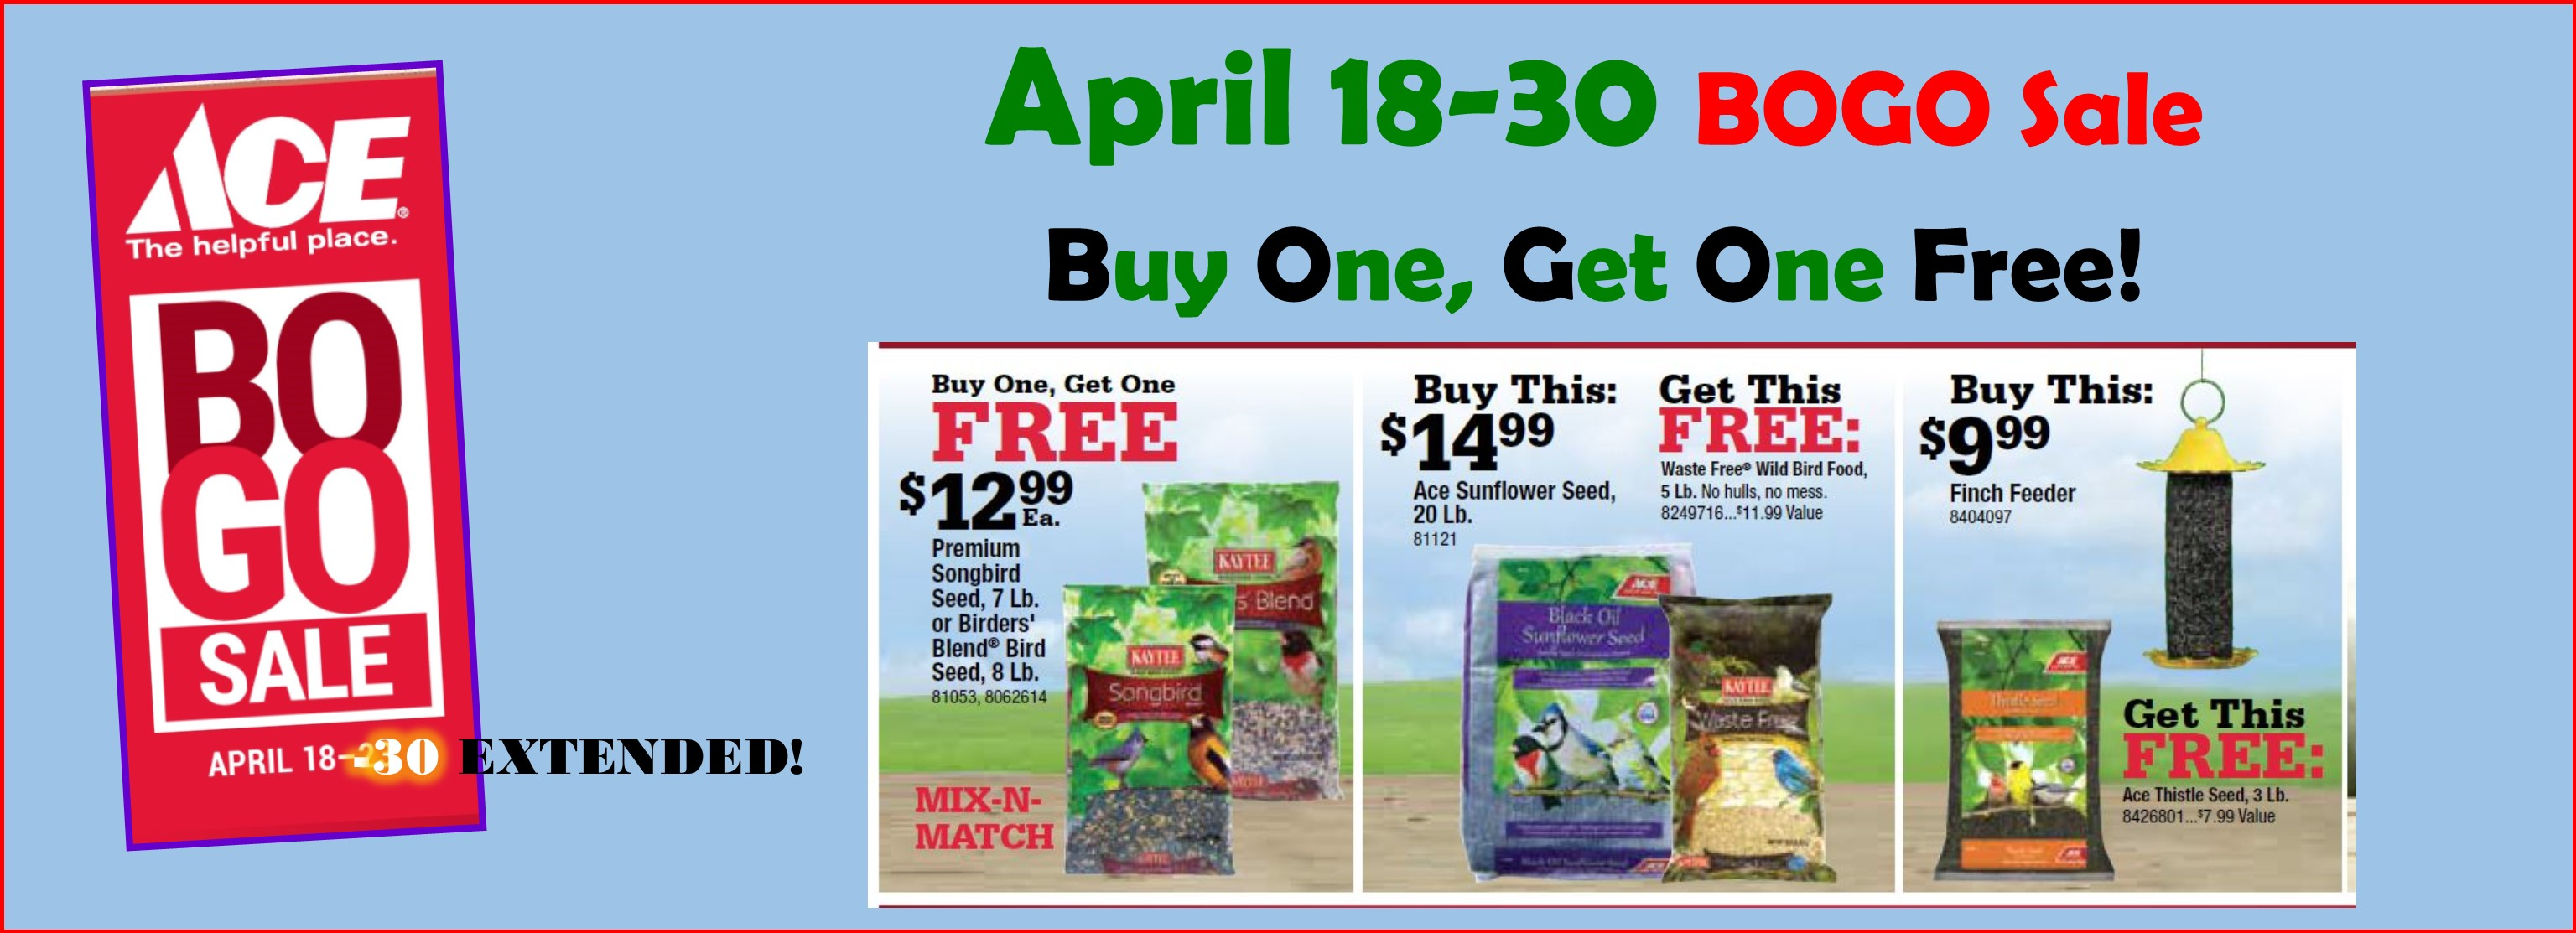 BOGO Sale April 18-30